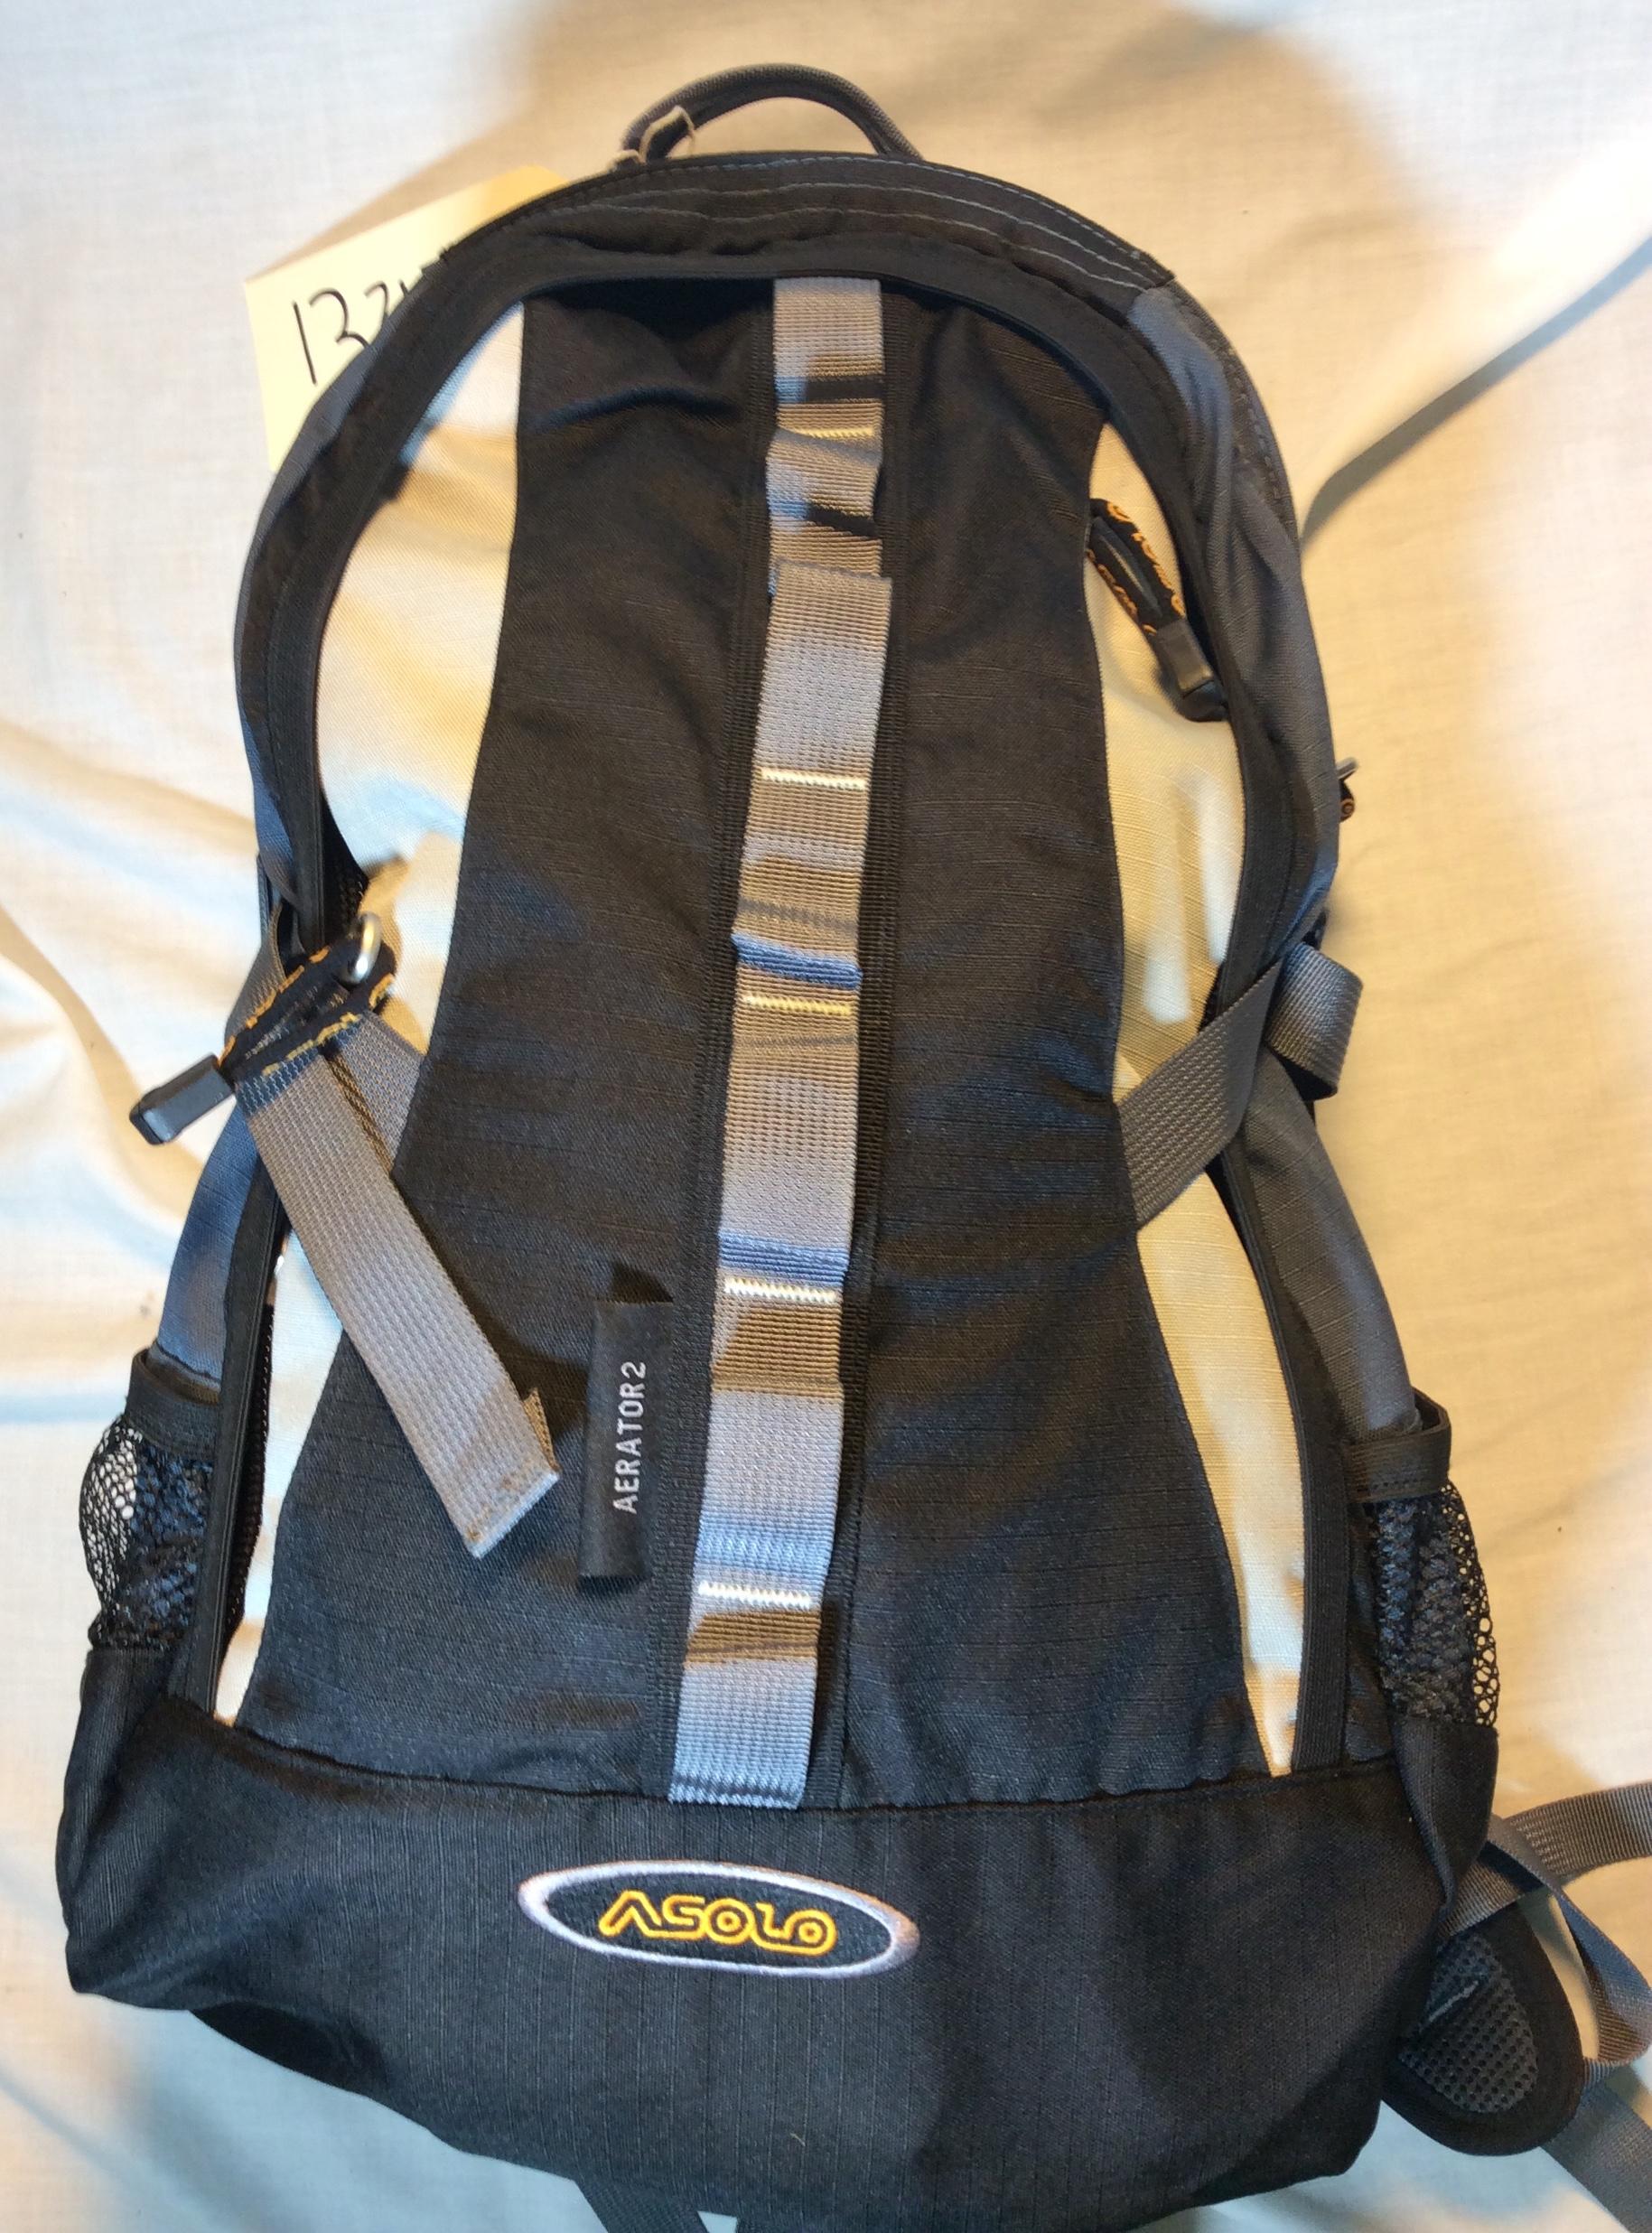 Asolo Aerator 2 backpack